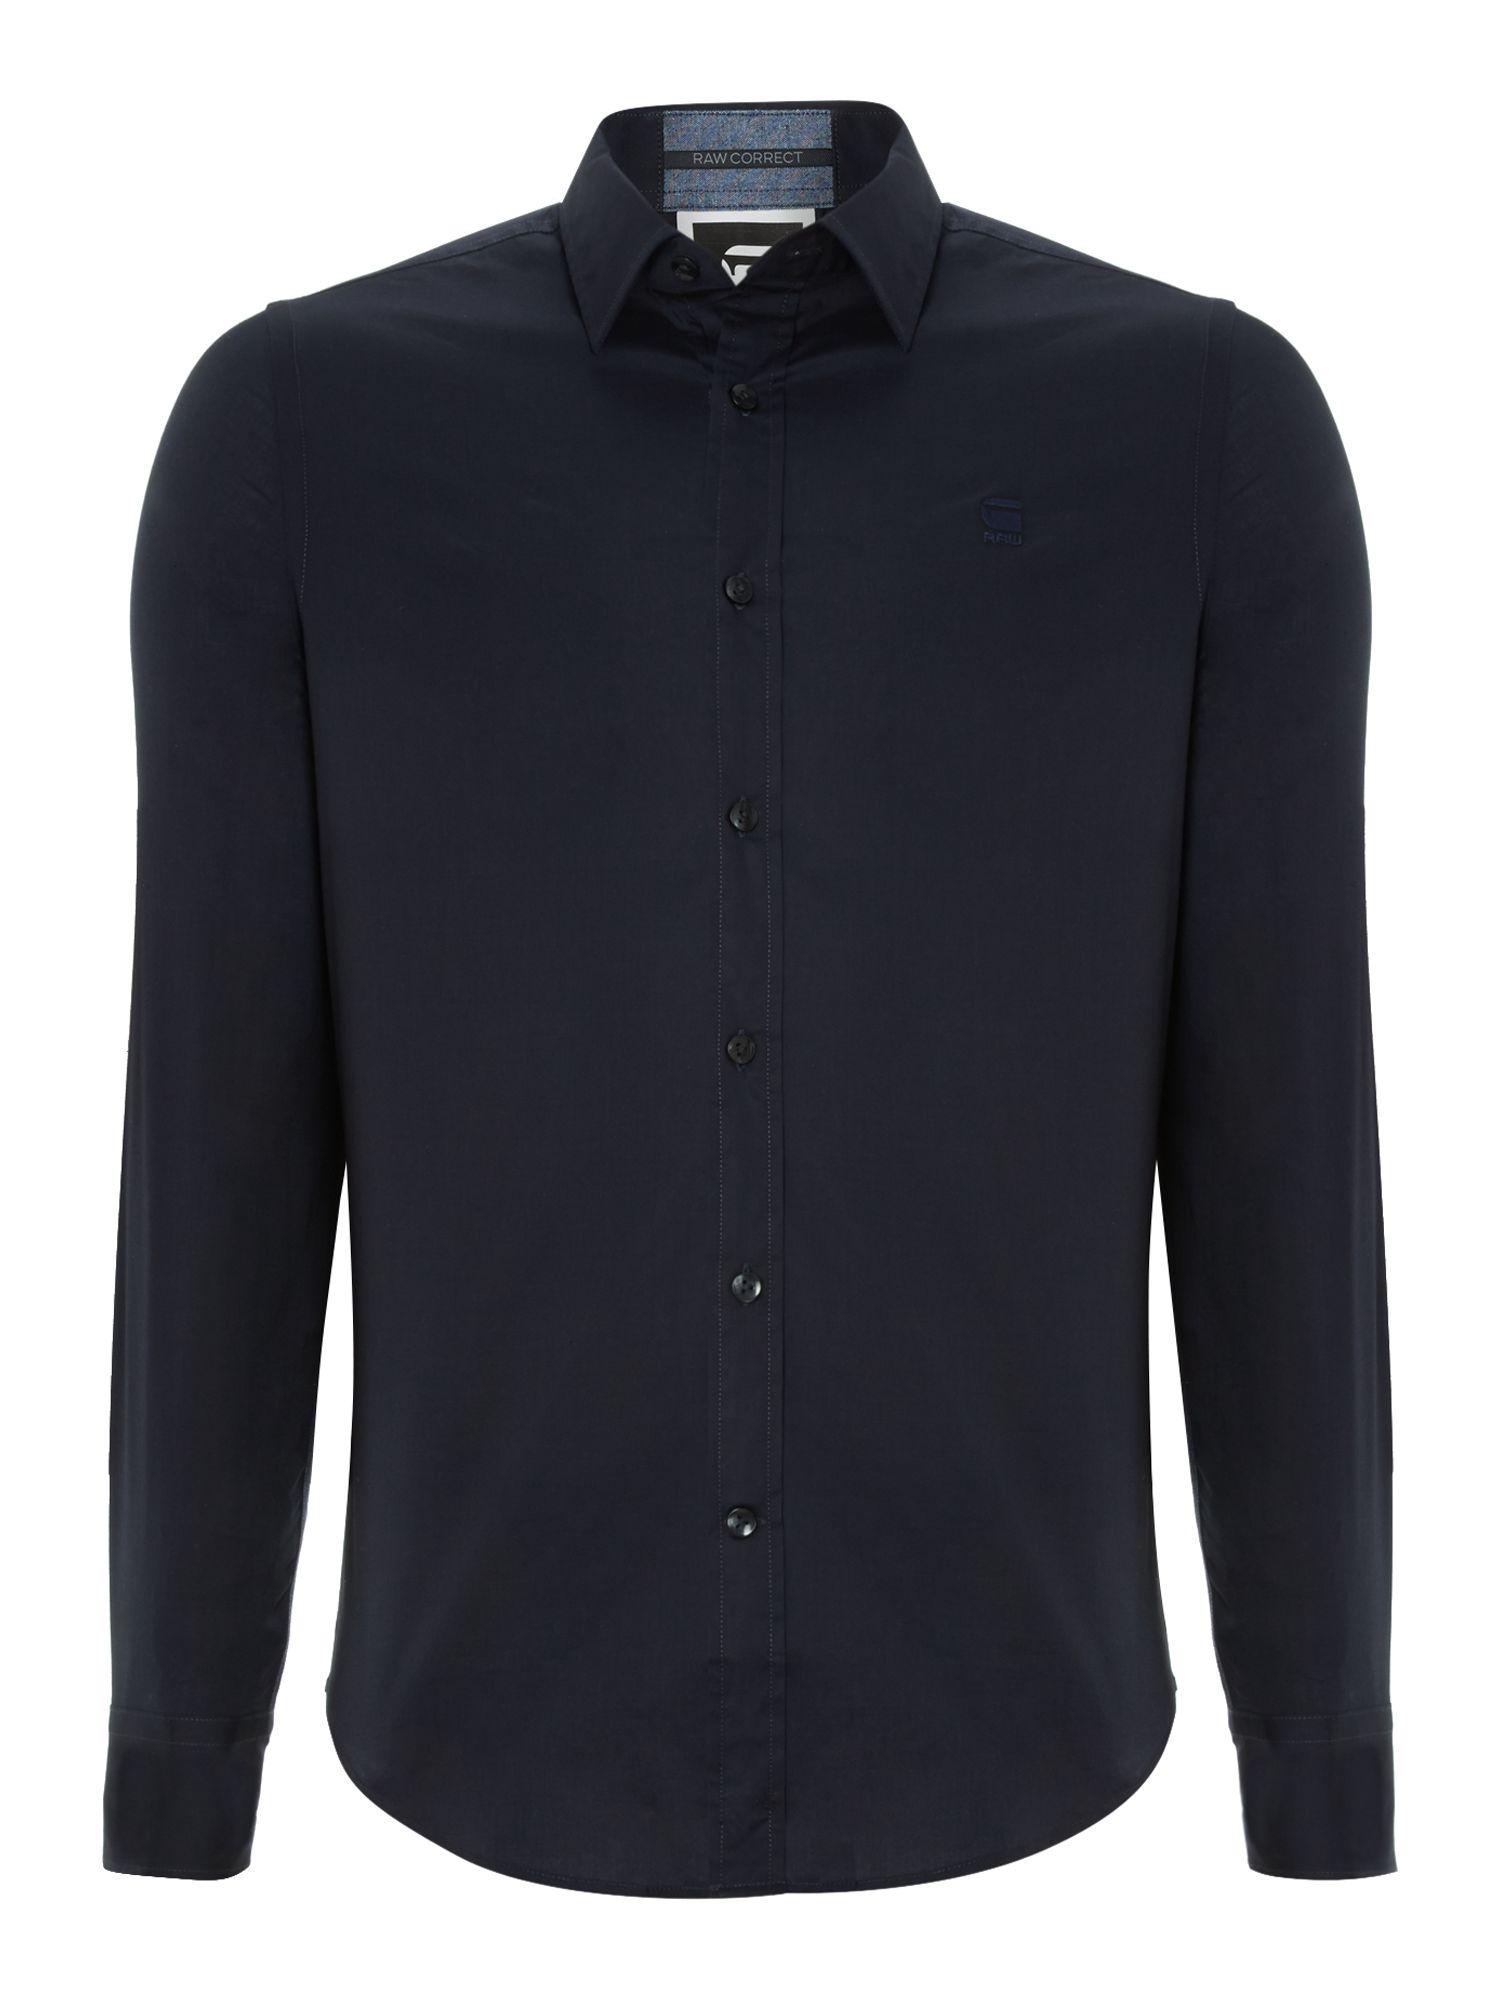 G star raw 2 pocket lightweight long sleeve shirt in blue for Long sleeve pocket shirts